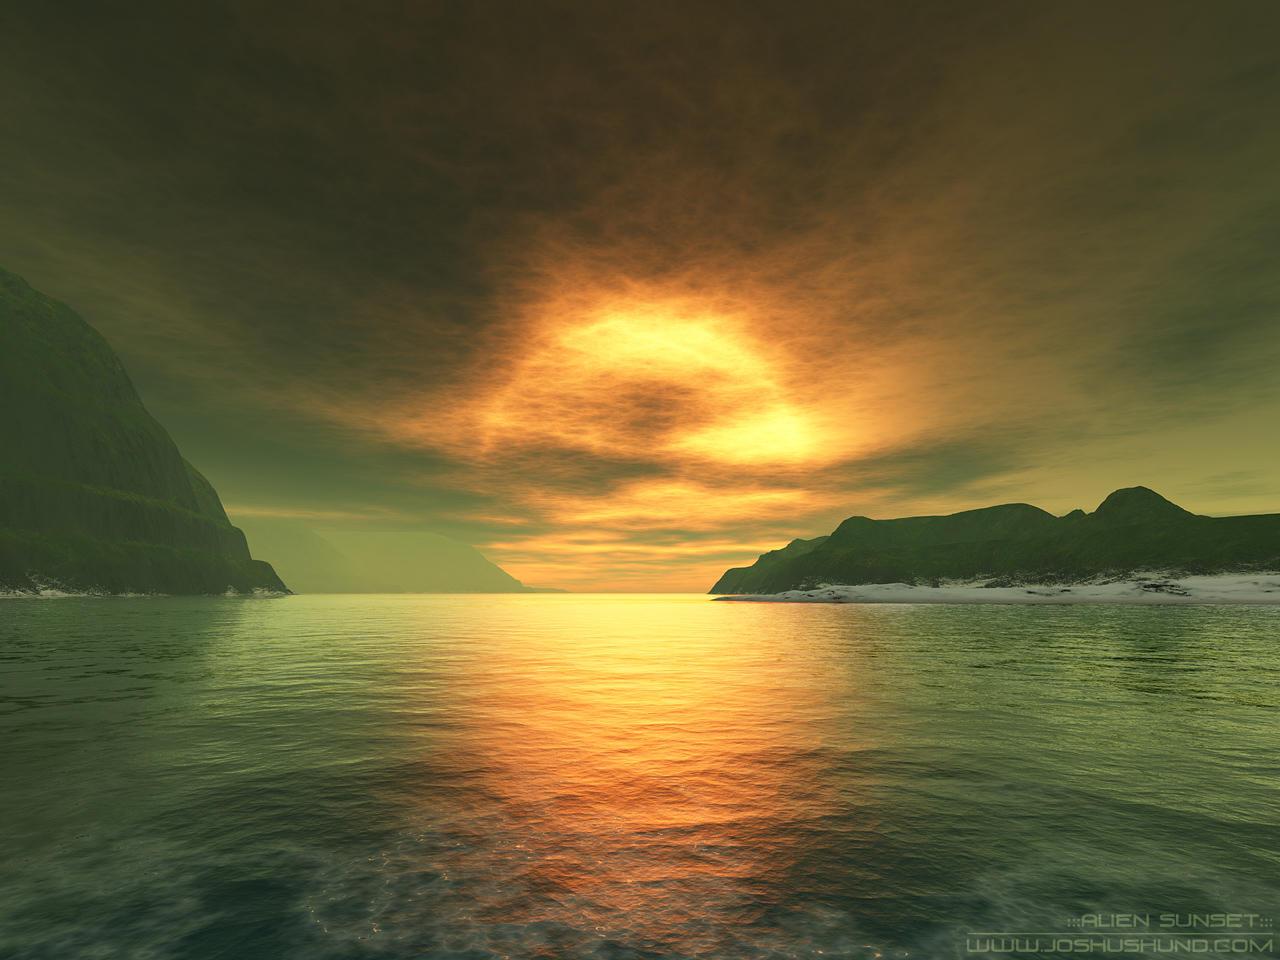 alien sunset wallpaper - photo #5